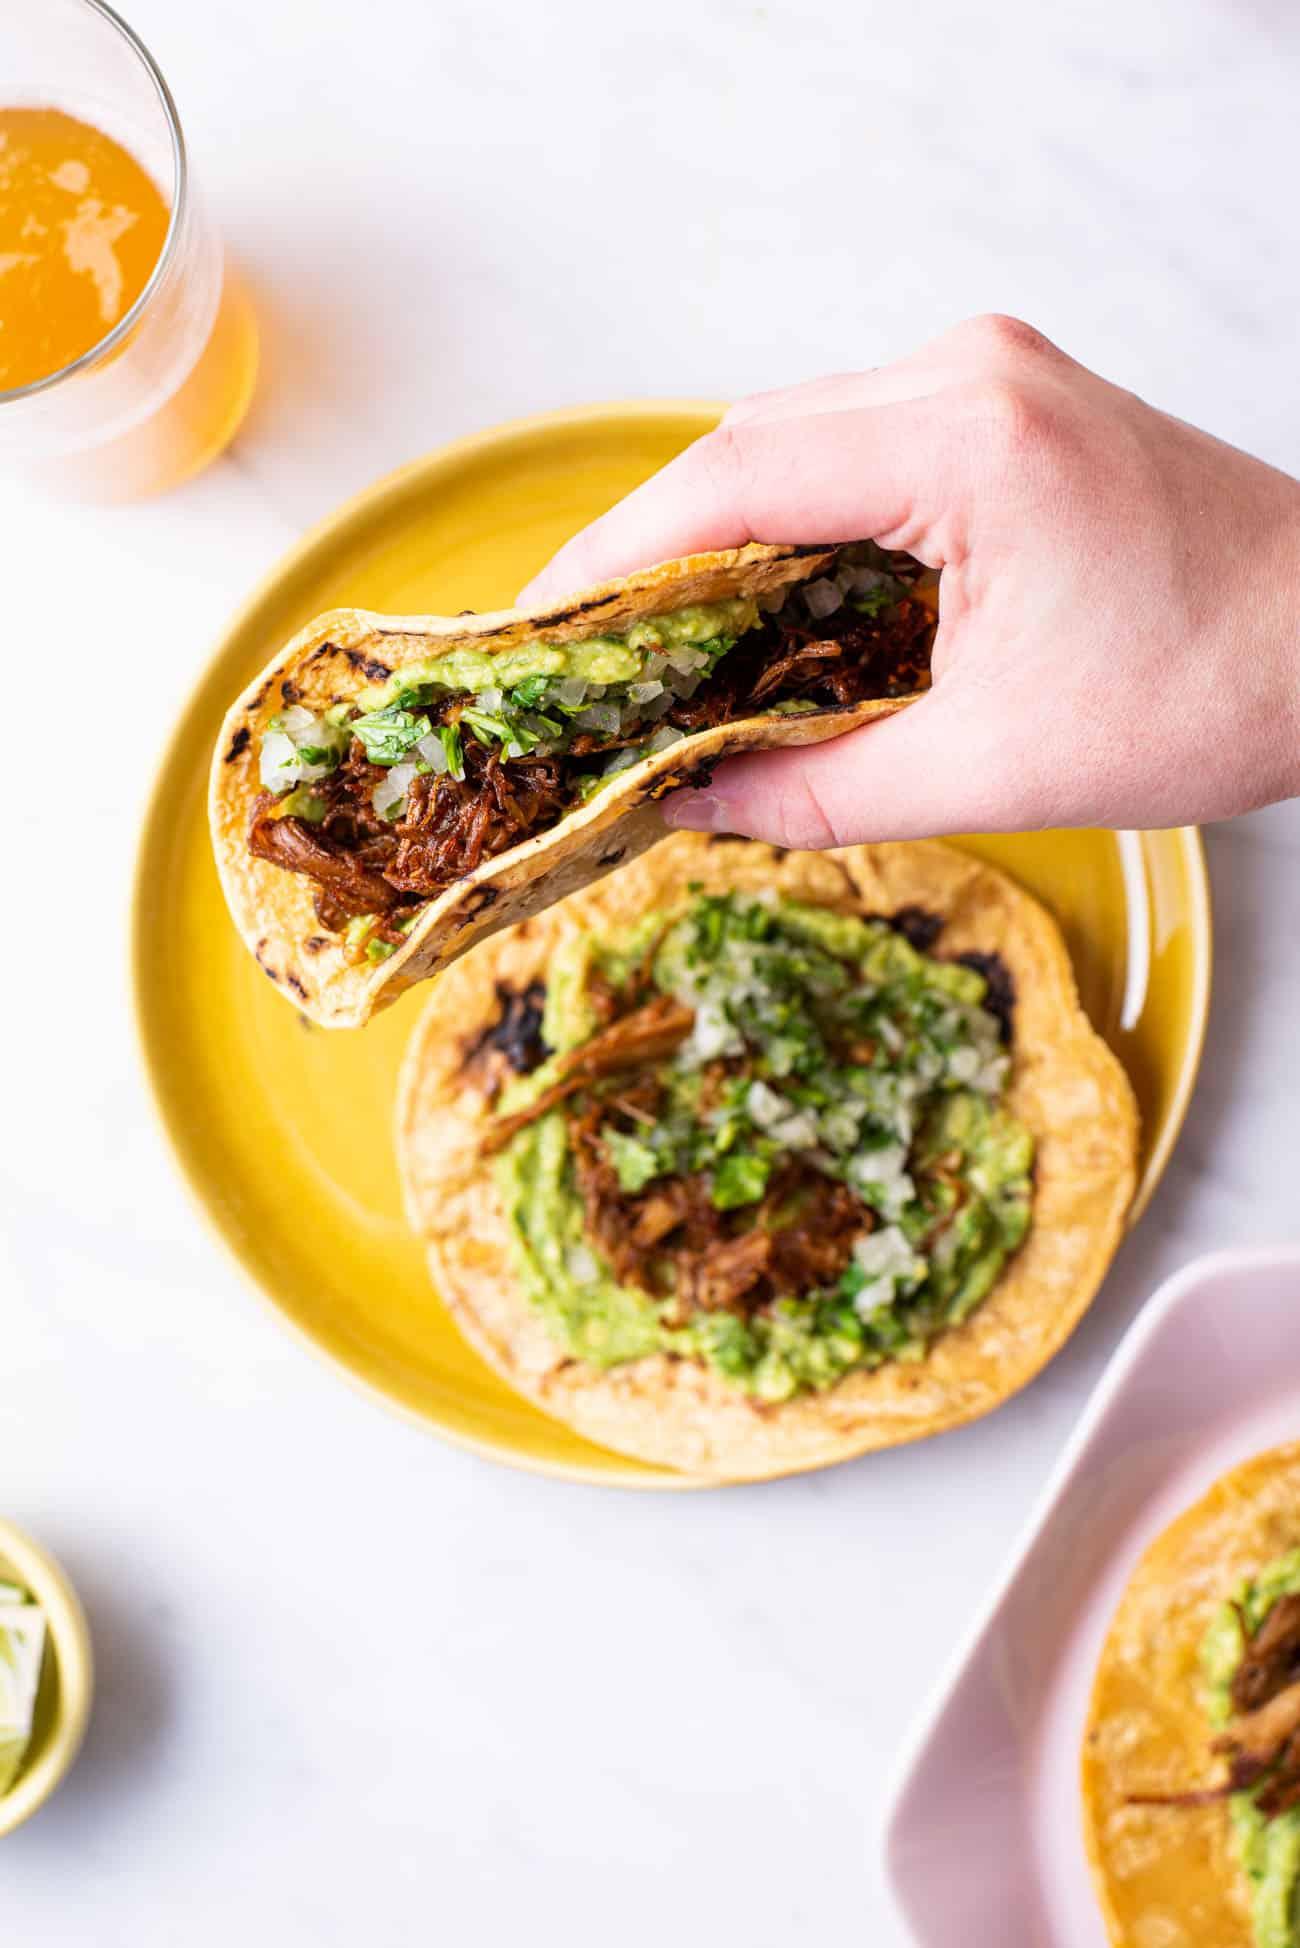 A hand holding a folded vegan carnitas taco